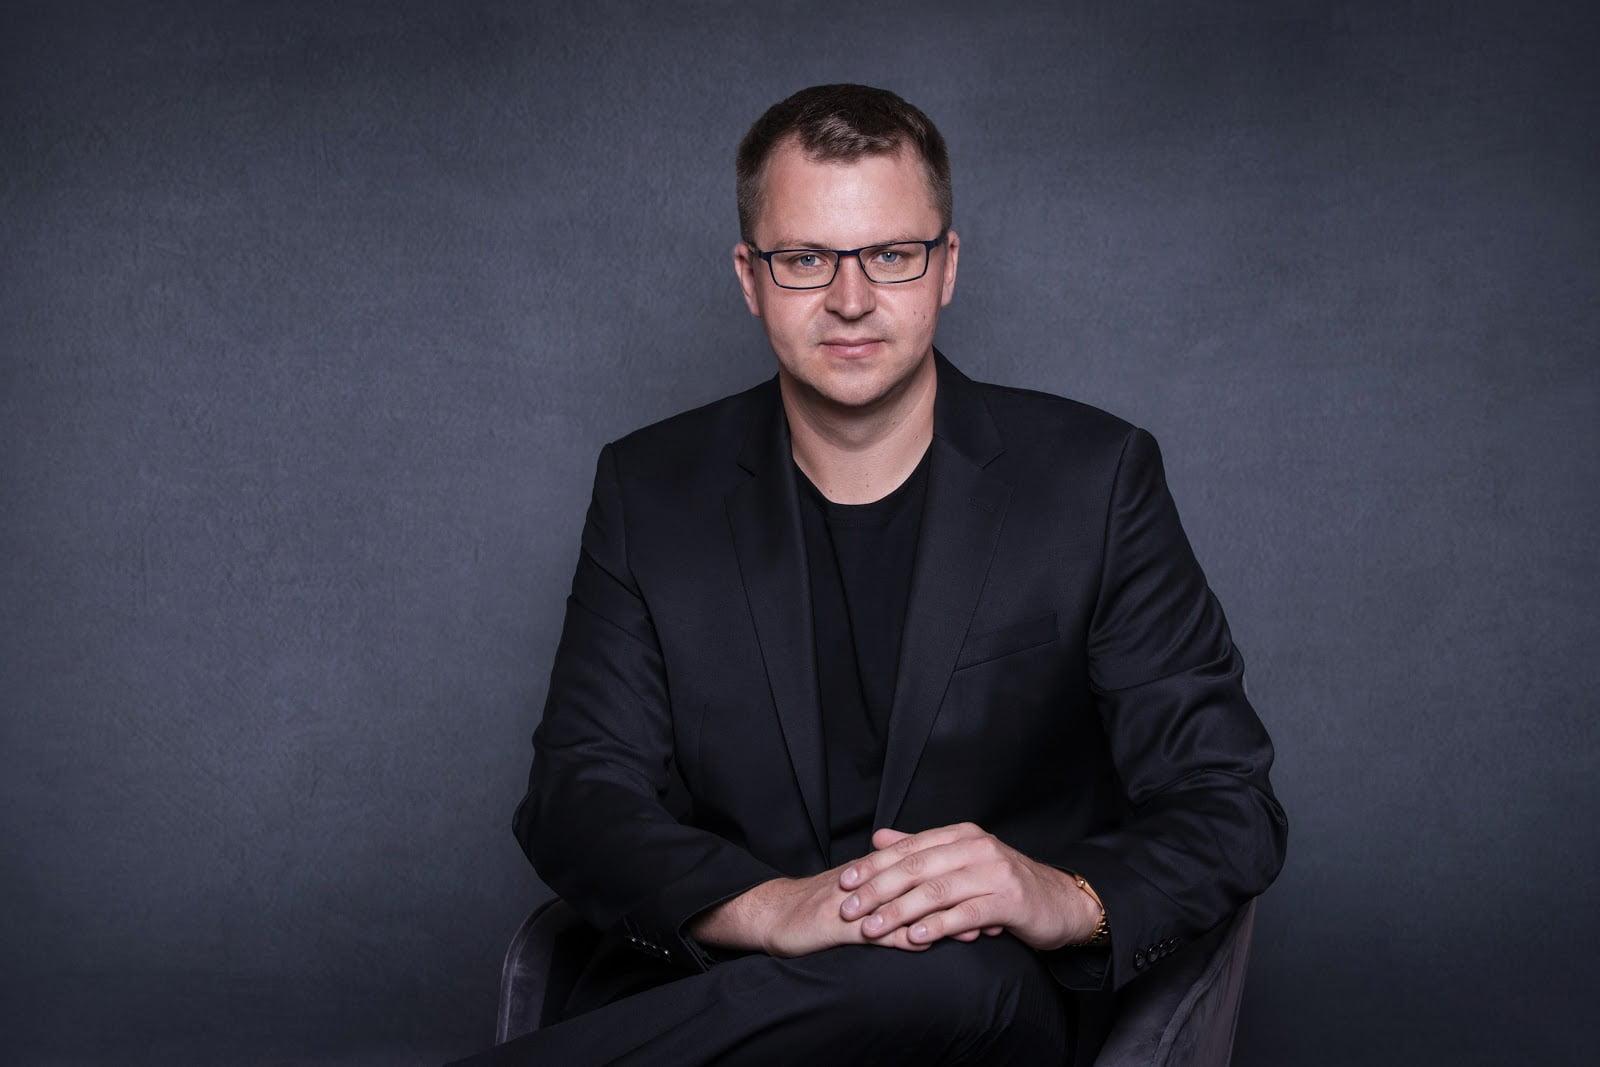 Marvin Steinberg